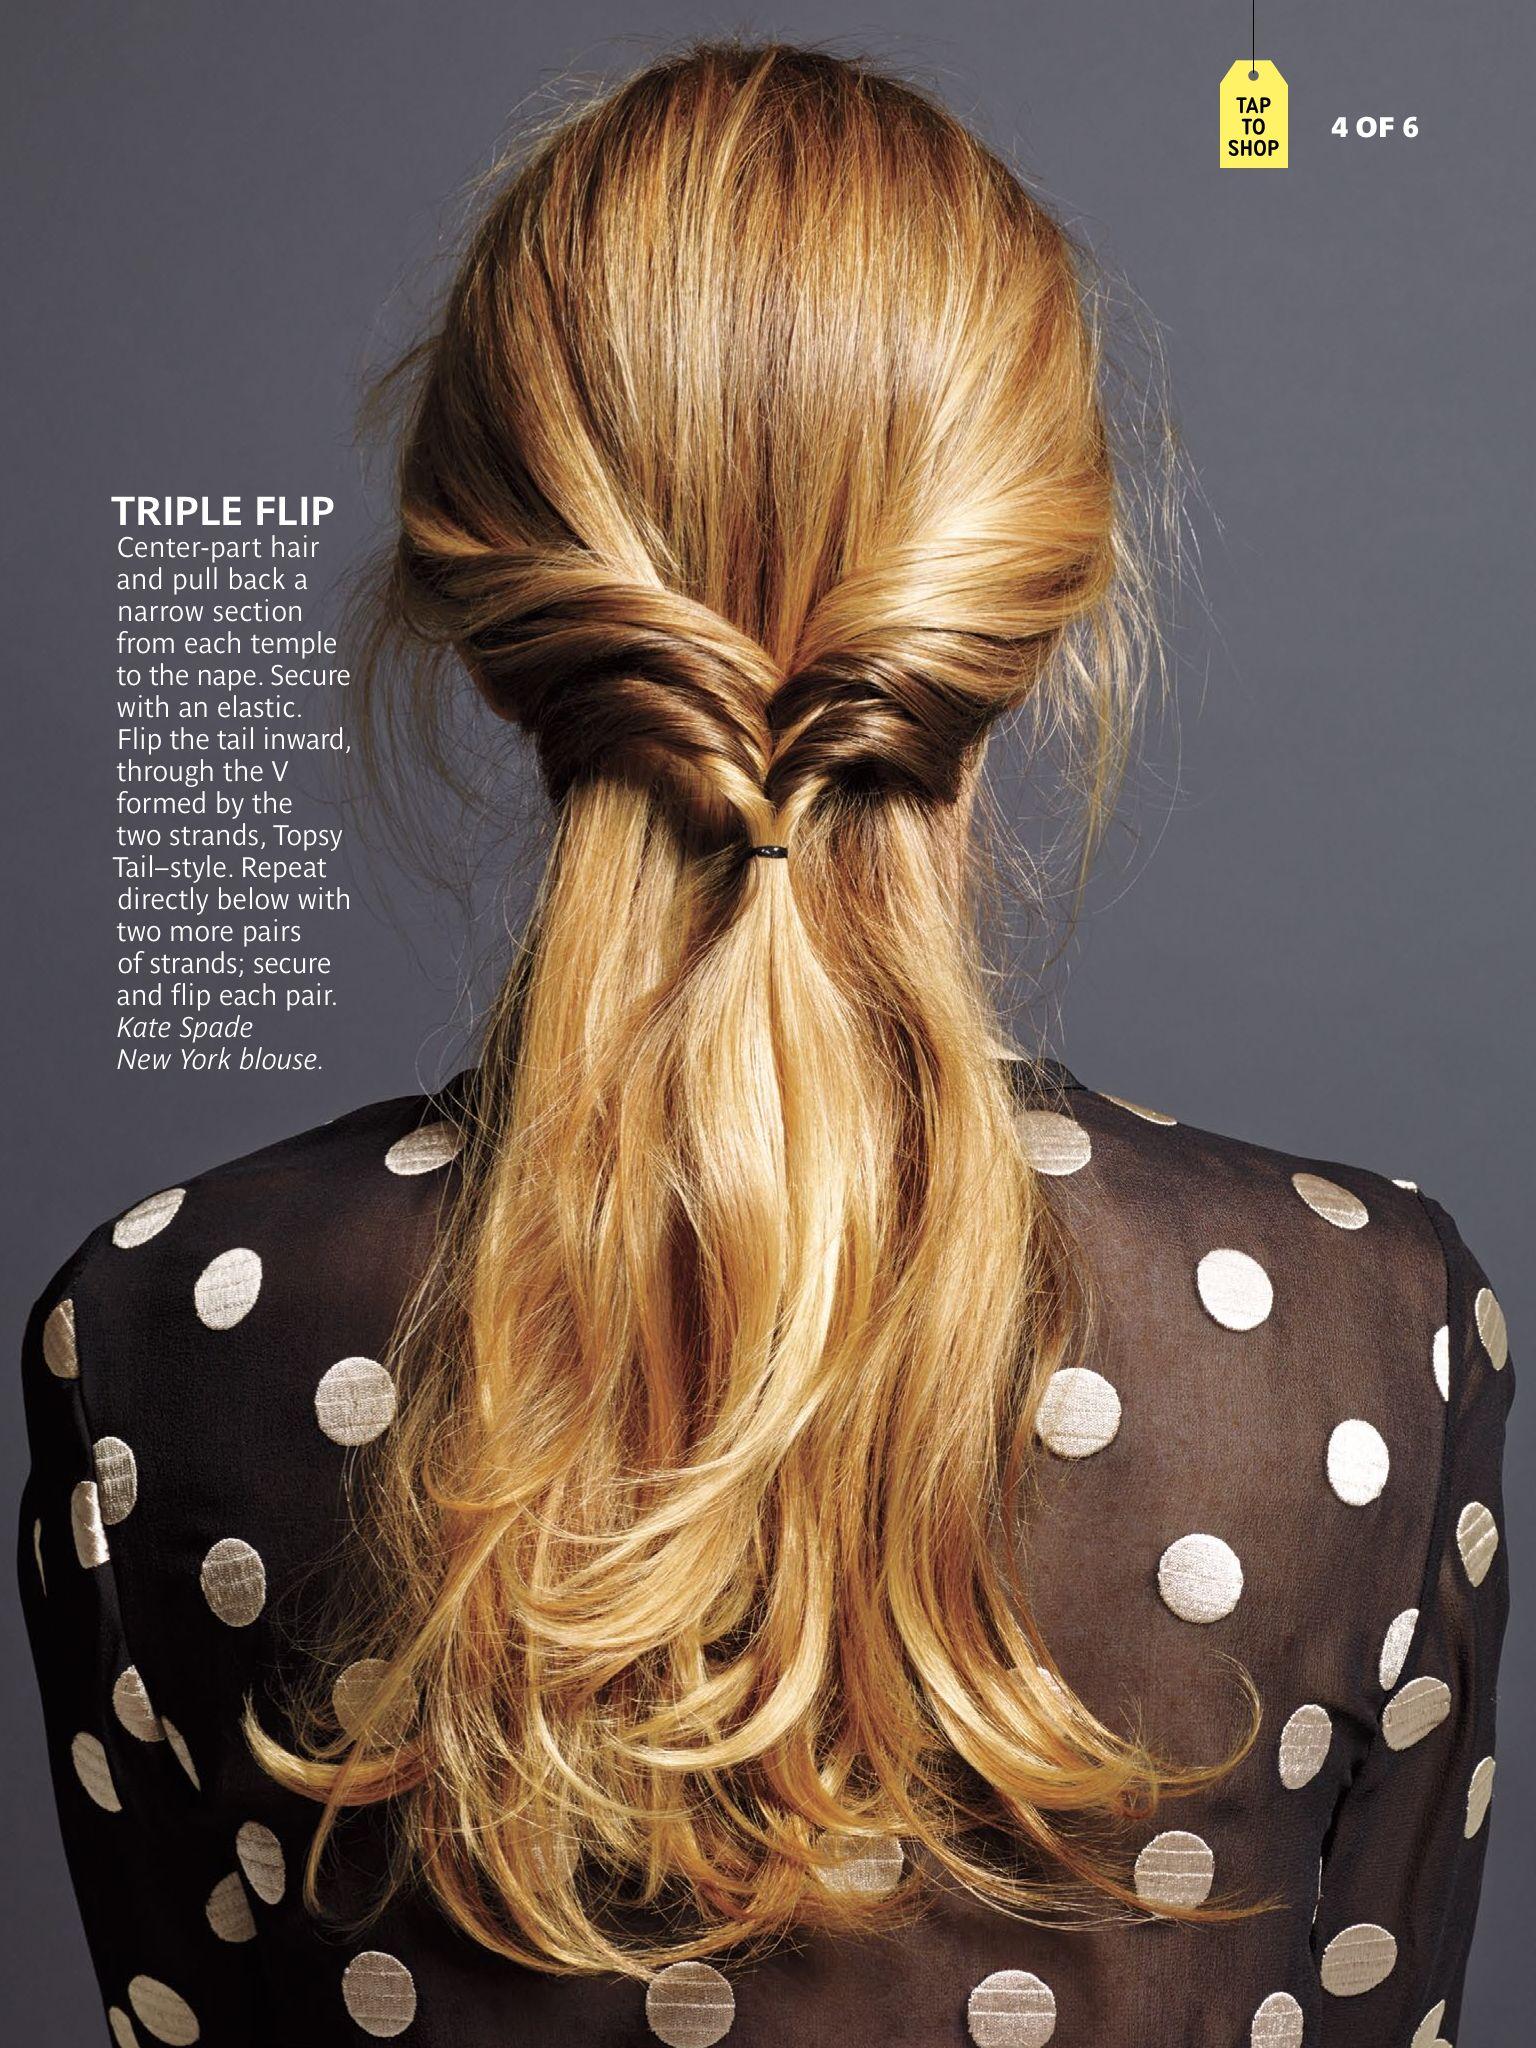 Triple flip hair do from November 2014 Real Simple magazine